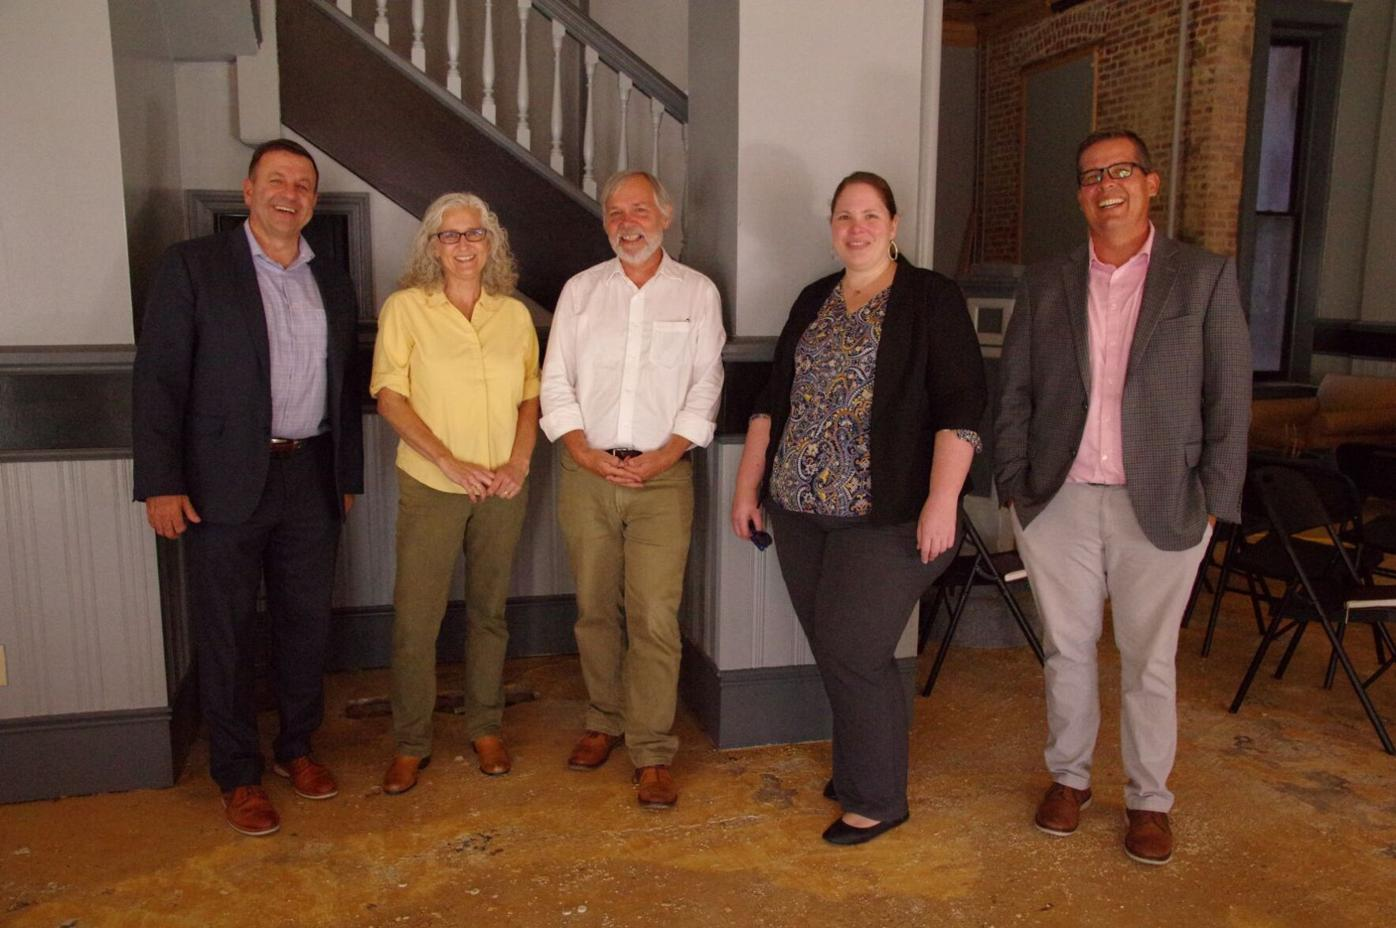 Woodlands and Taylor Hospitality leadership teams